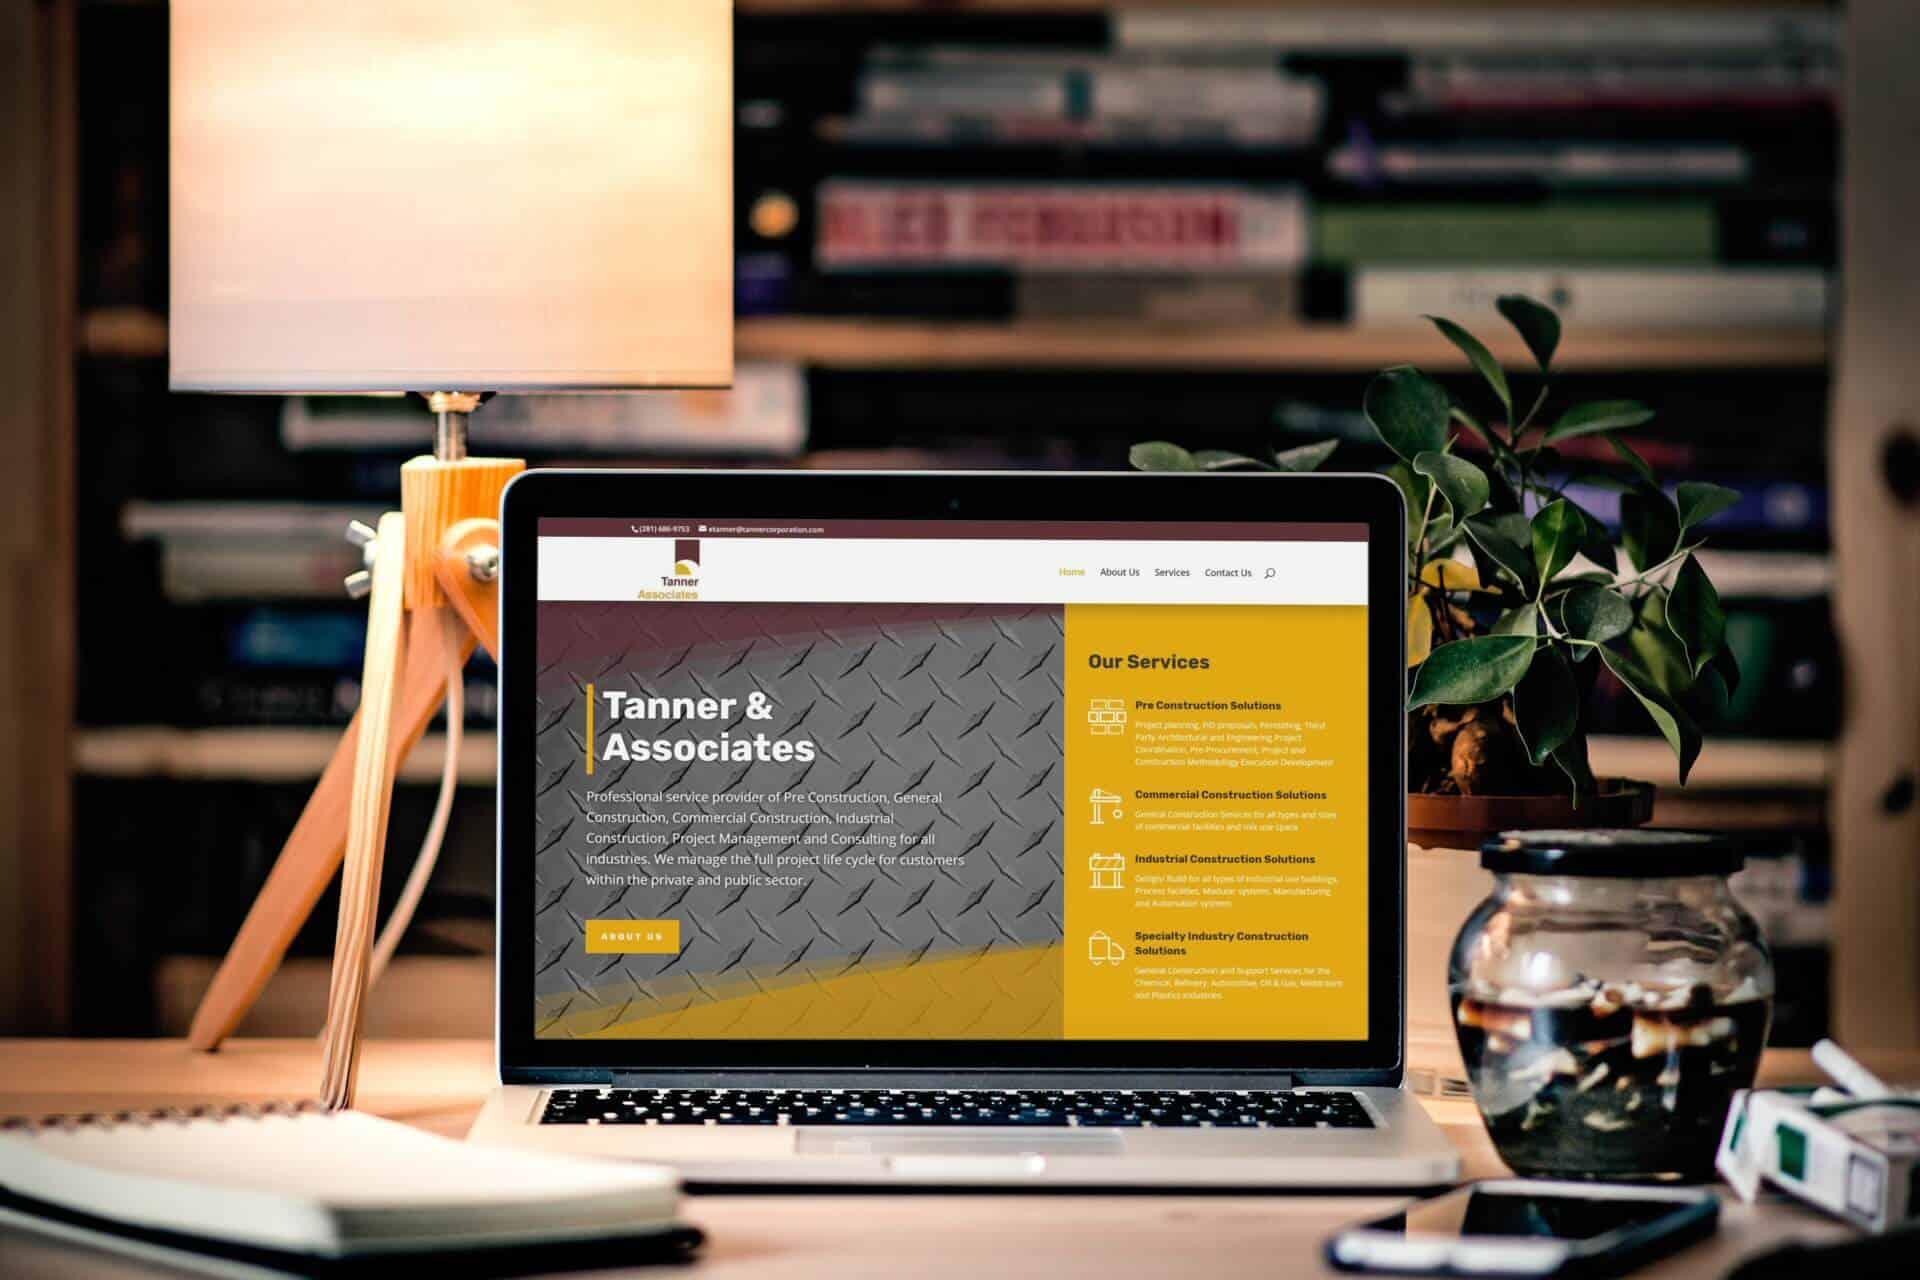 Tanner & Associates Website Design